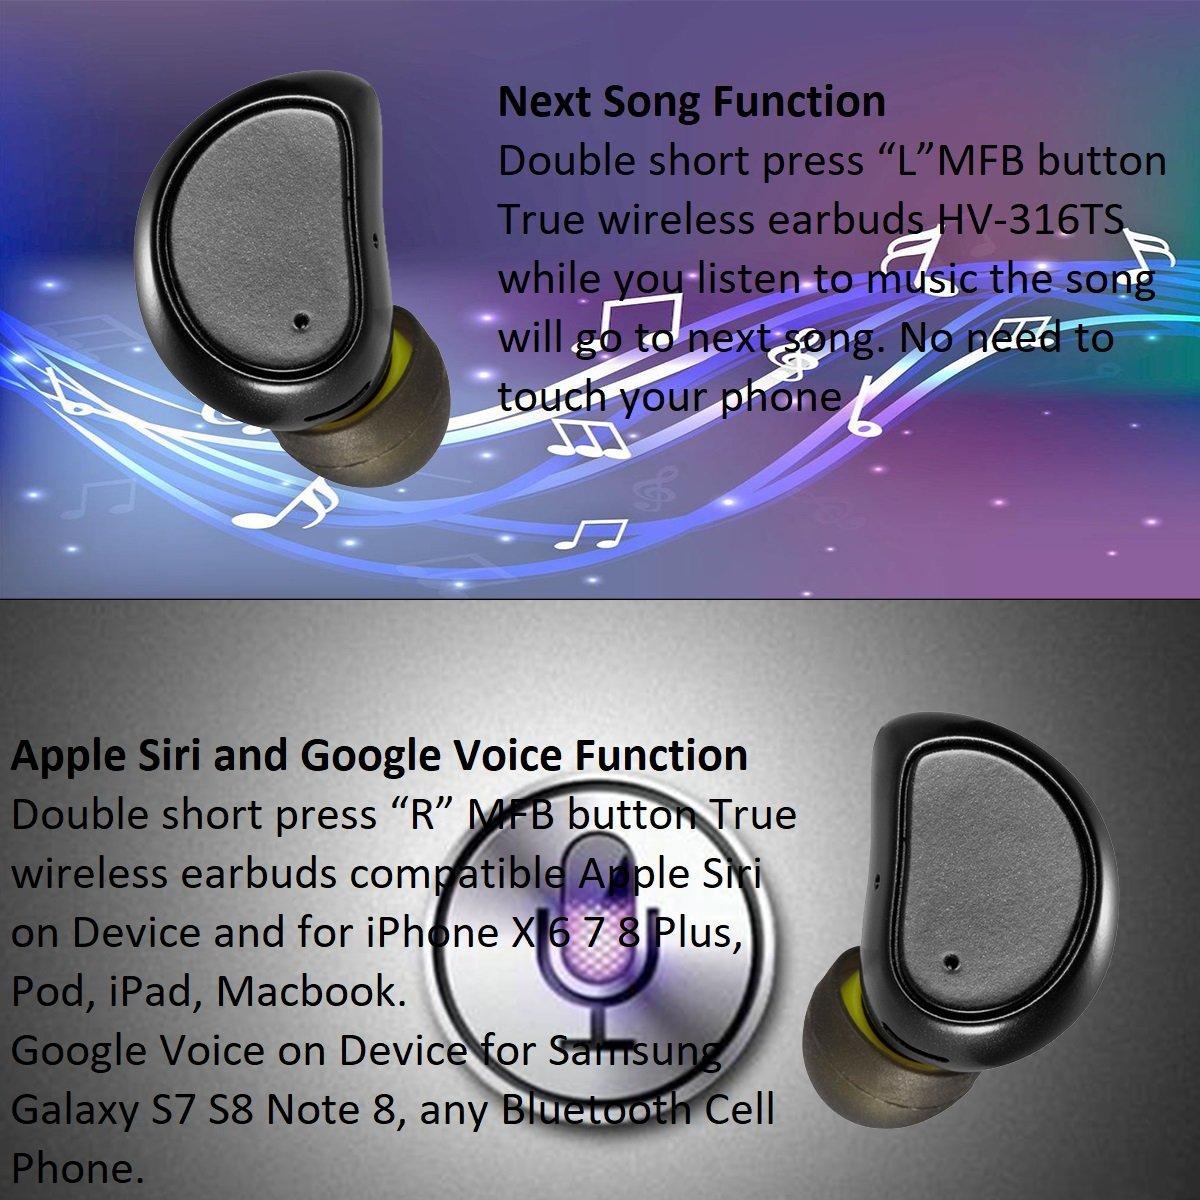 Siguiente Canción función auriculares Bluetooth inalámbrico inalámbrica Bluetooth auriculares con micrófono cancelación de ruido auriculares a prueba de ...